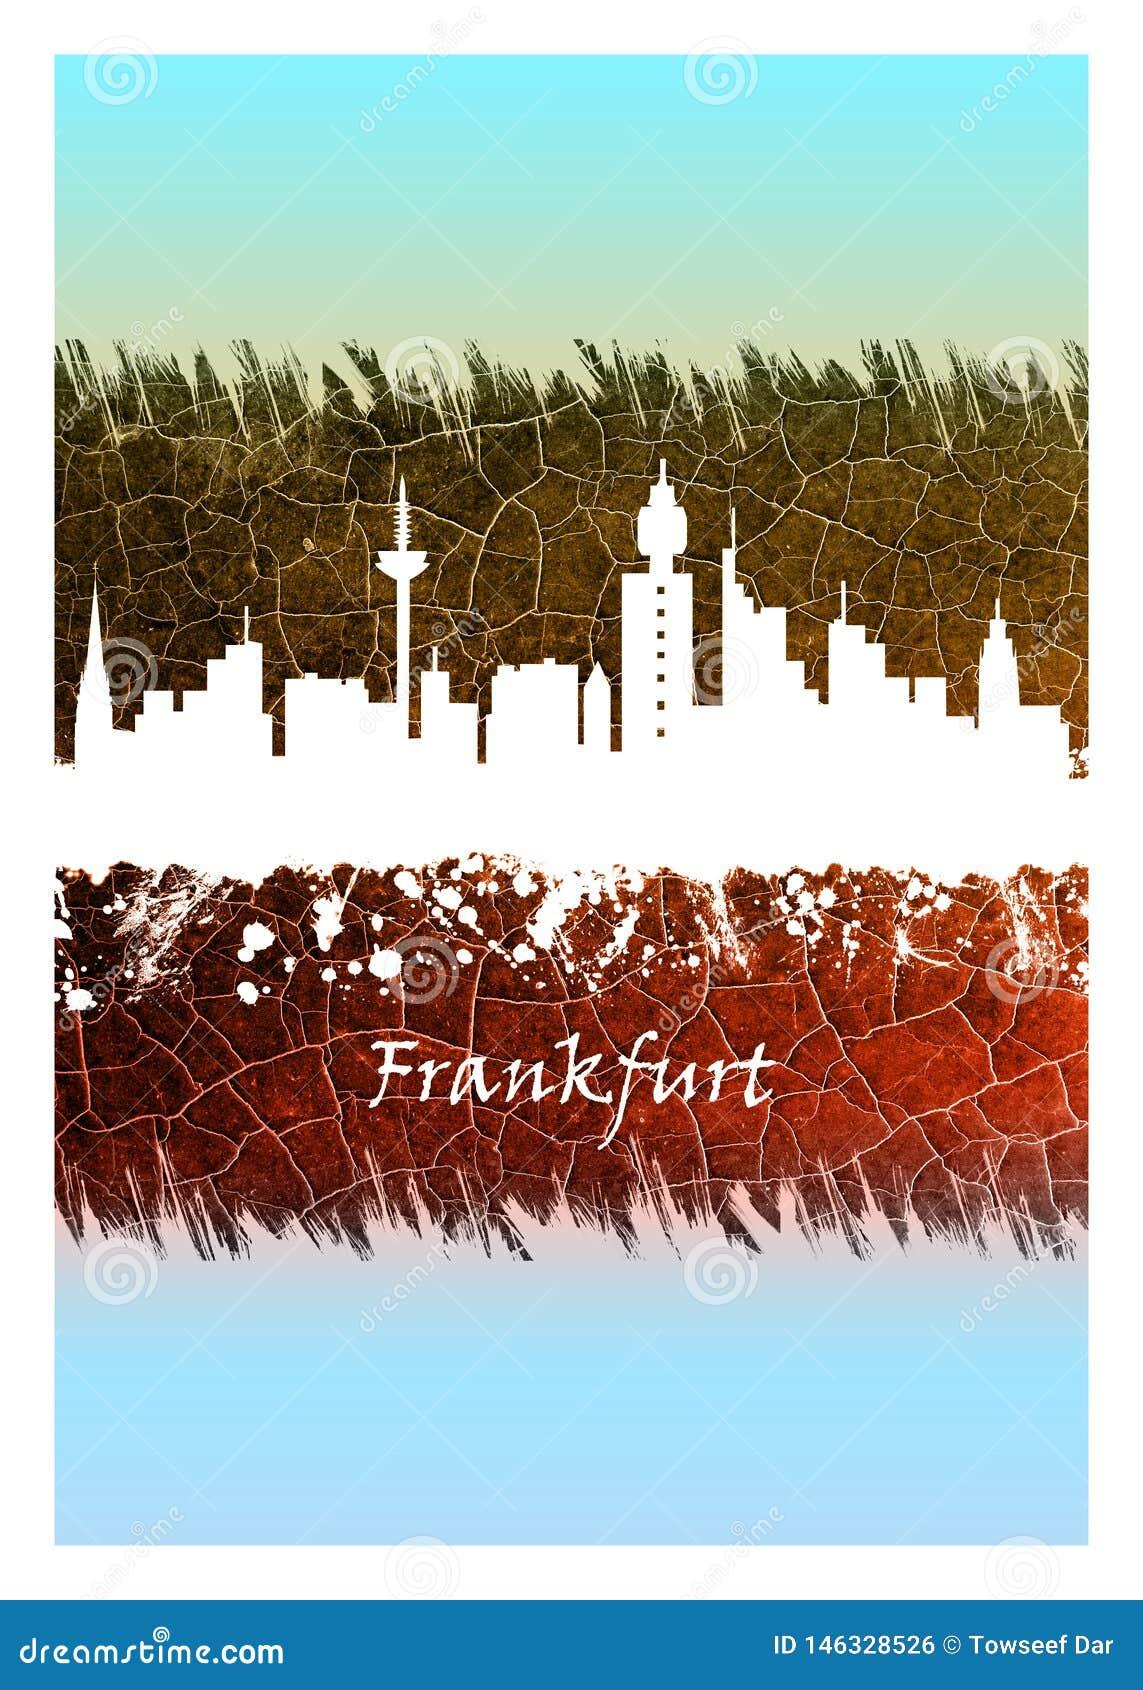 Frankfurt Skyline Blue and White